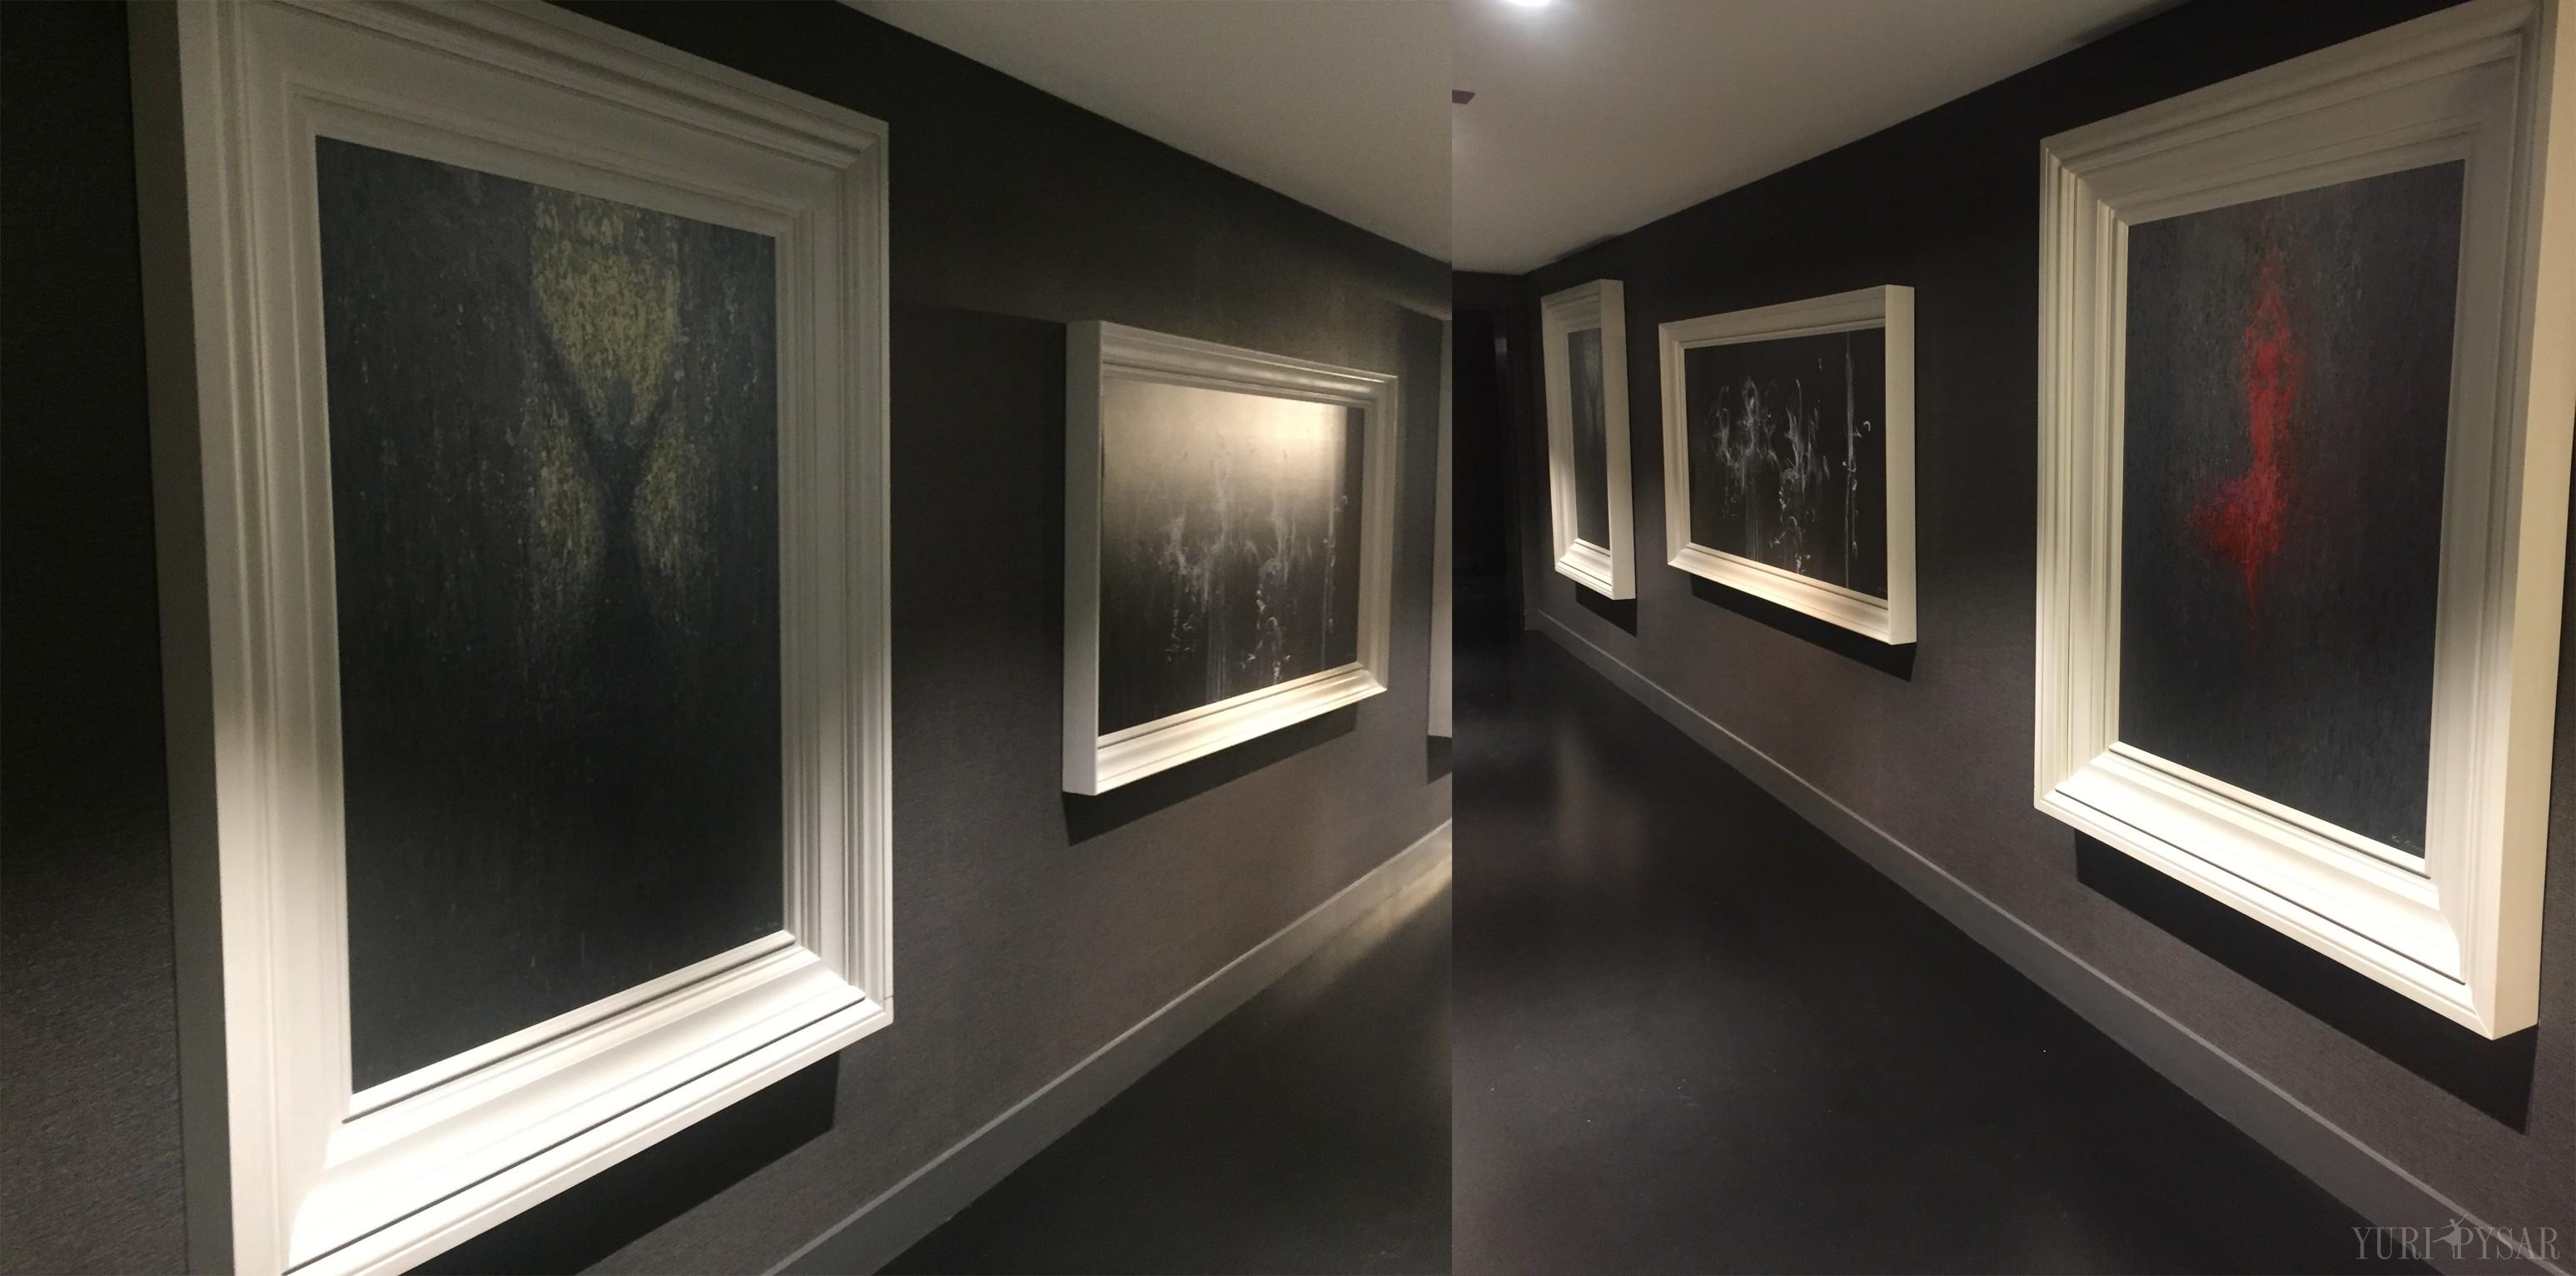 yuri pysar paintings in chicago renaissance hotel